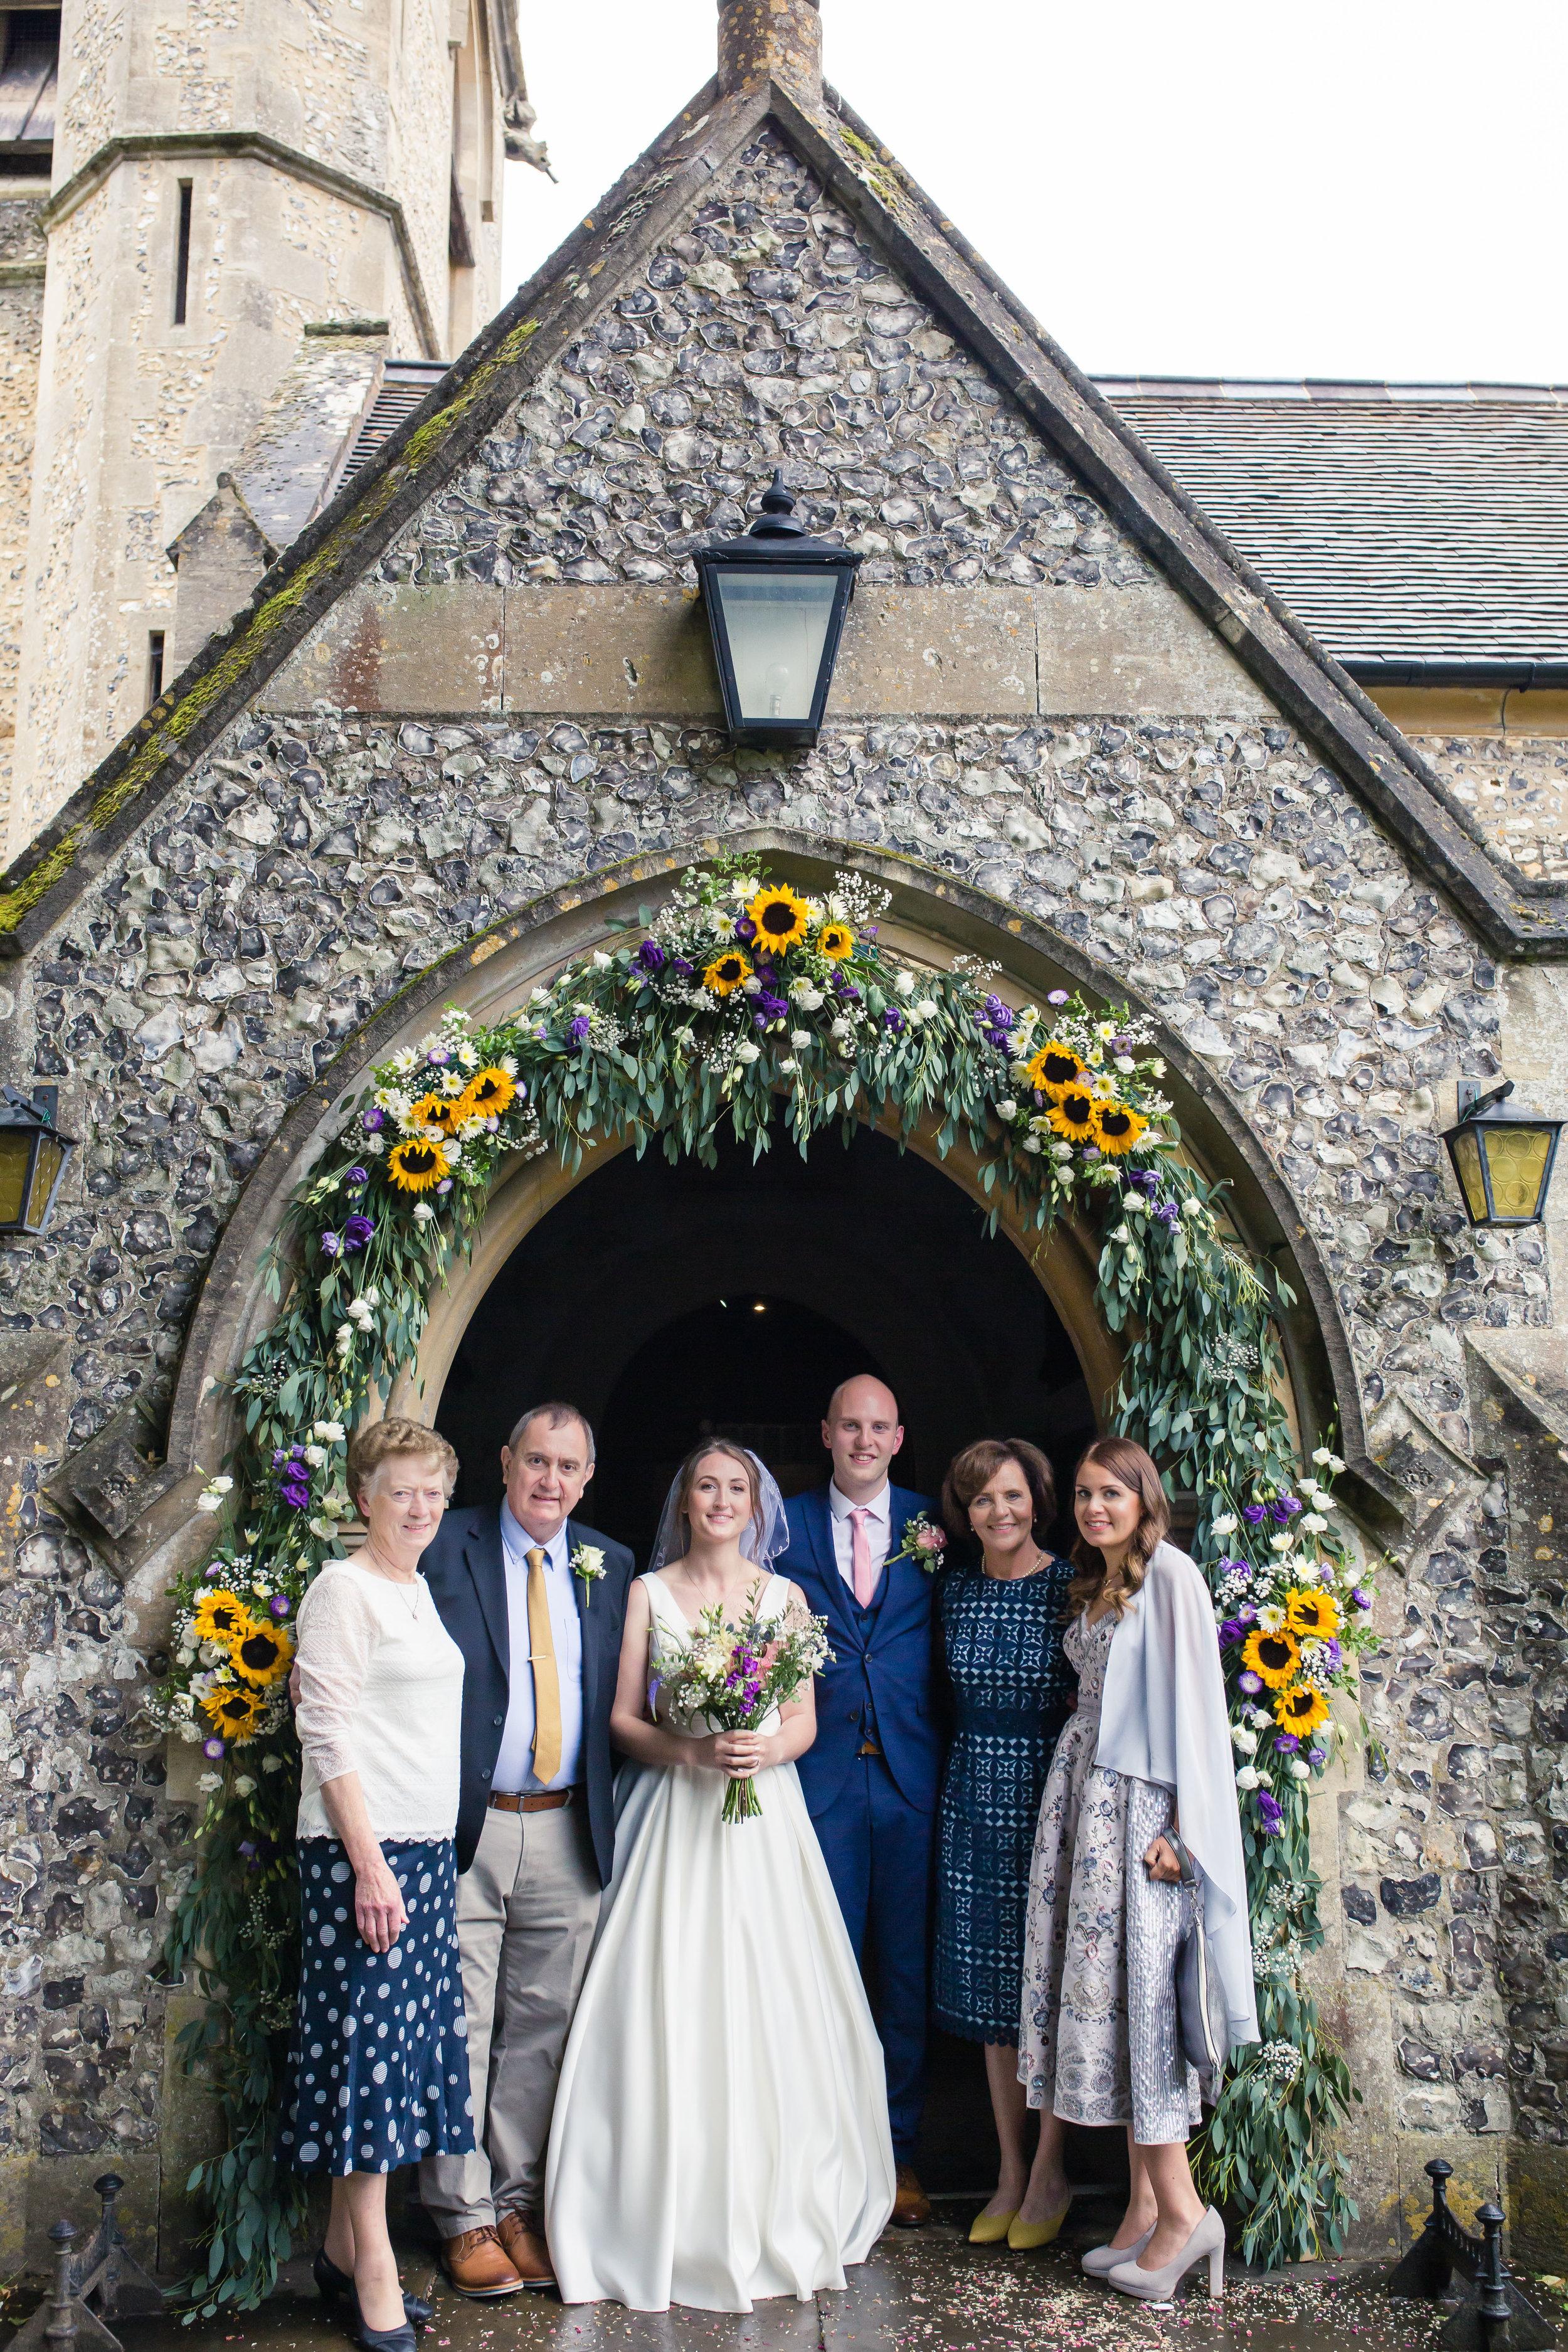 family photo chenies st Michael church wedding diana von r London photographer